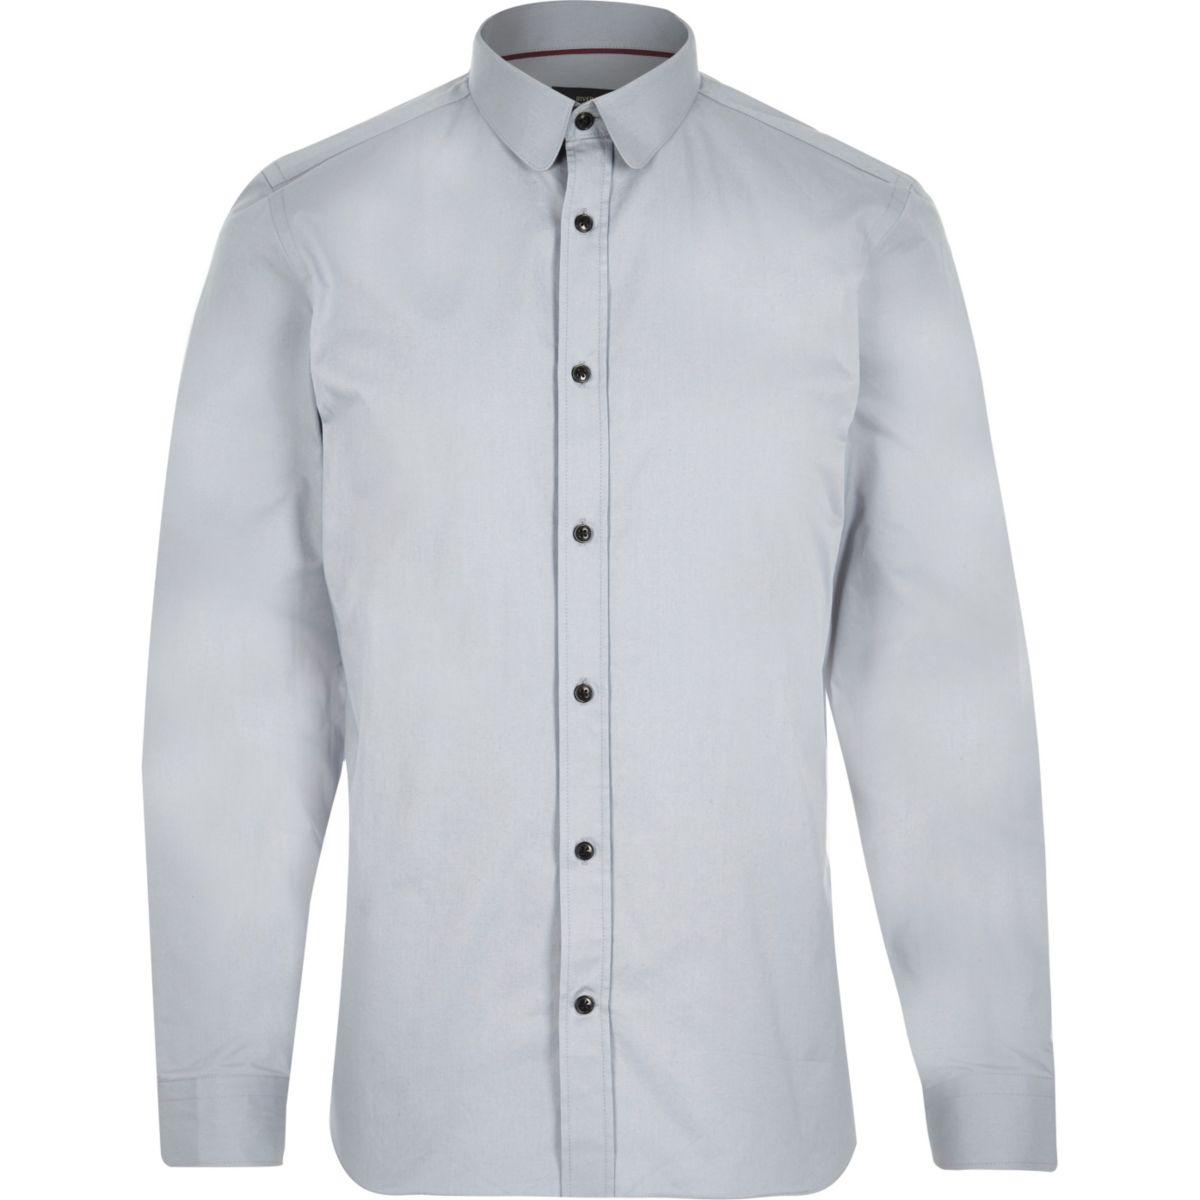 Grey penny collar long sleeve shirt